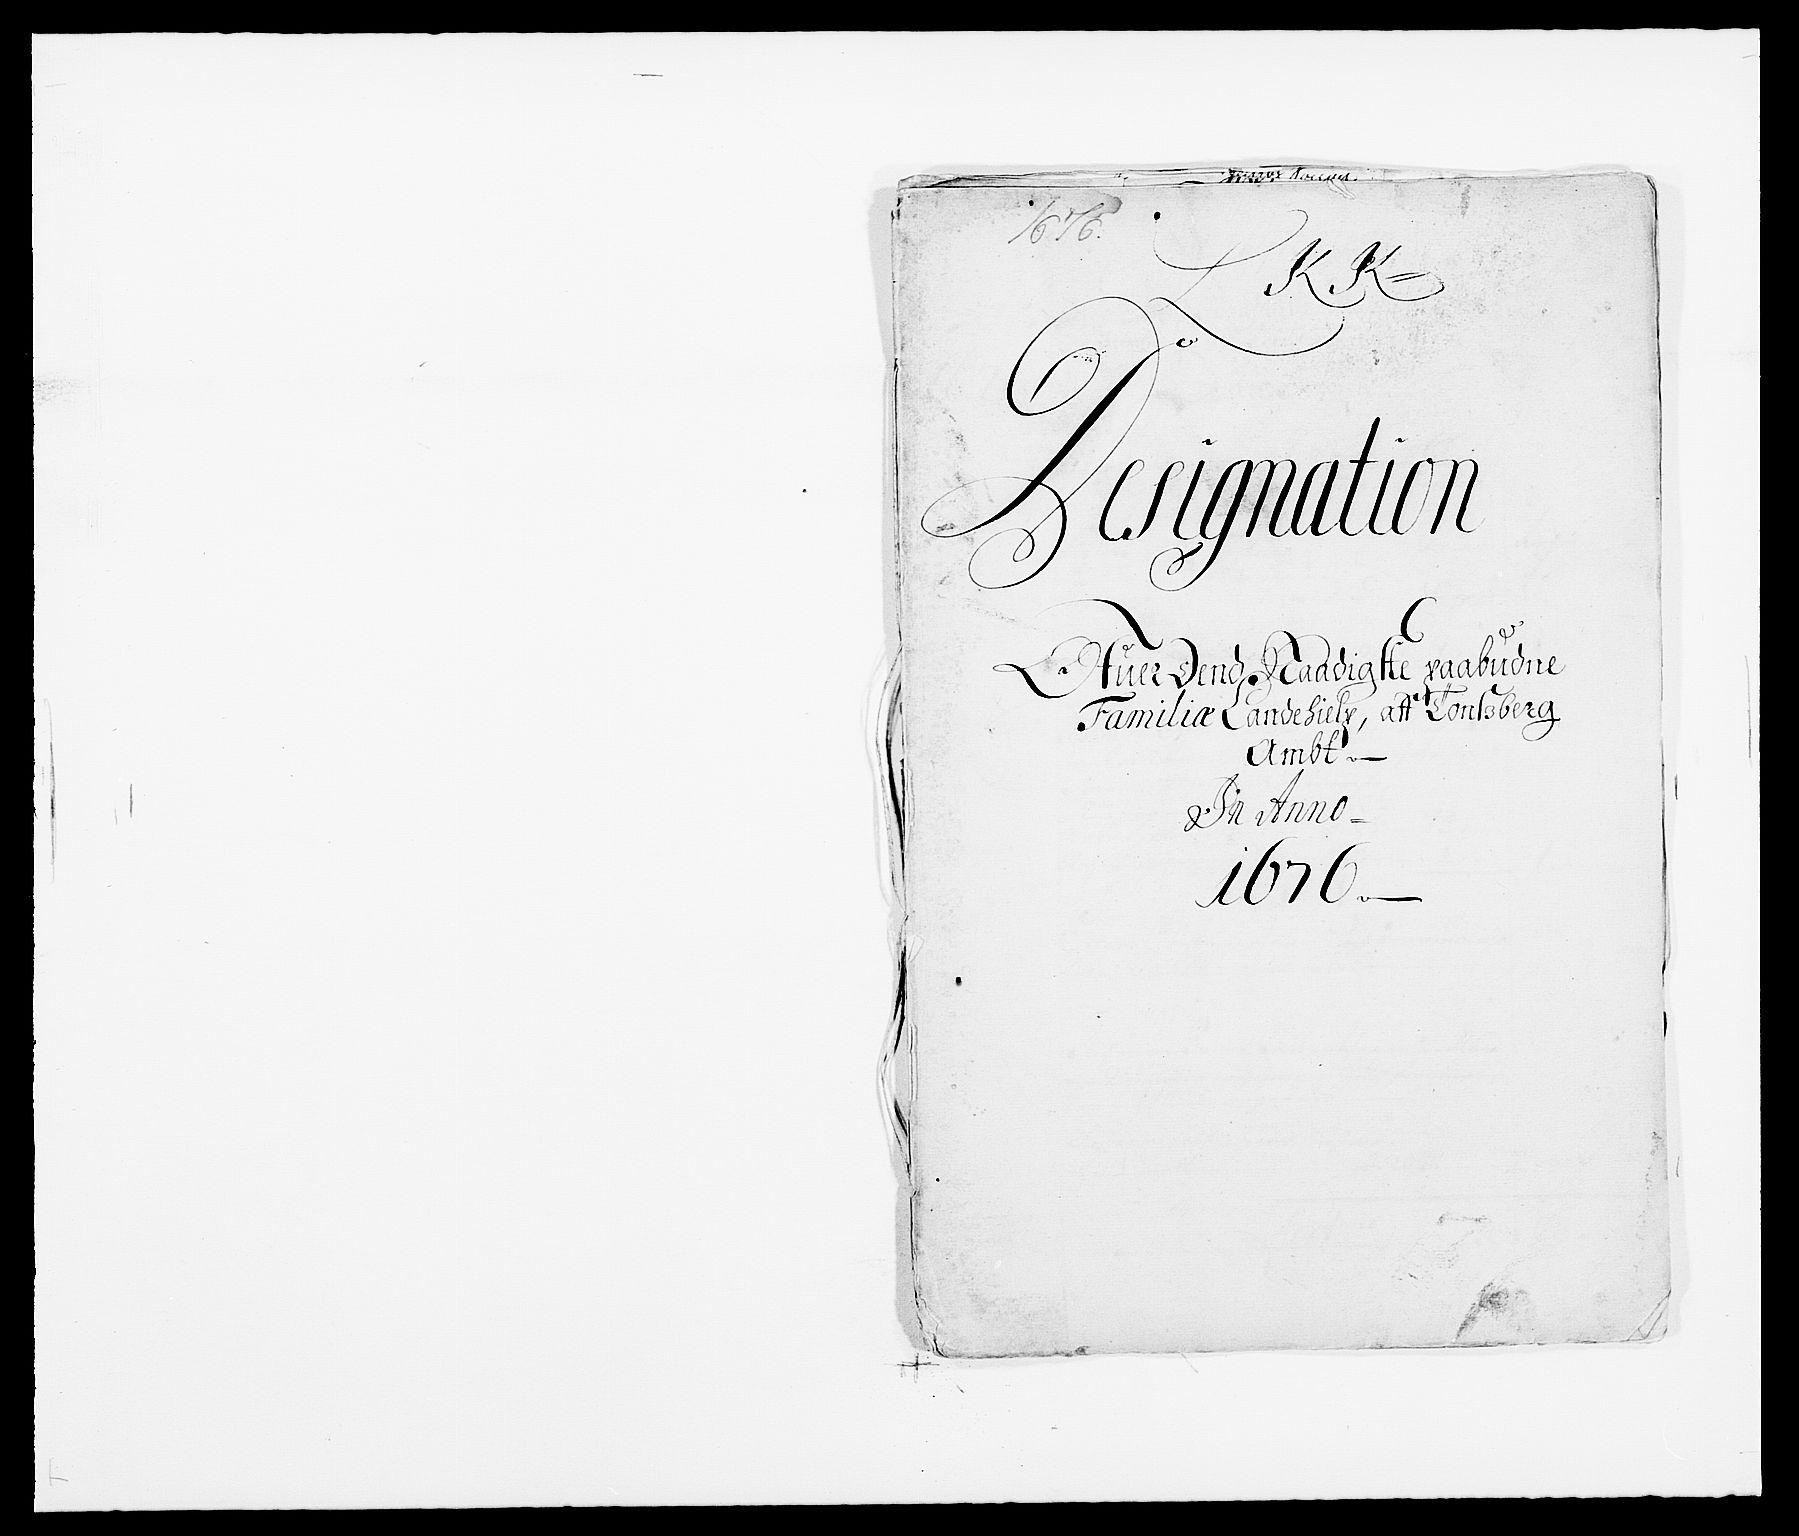 RA, Rentekammeret inntil 1814, Reviderte regnskaper, Fogderegnskap, R32/L1845: Fogderegnskap Jarlsberg grevskap, 1676-1678, s. 241